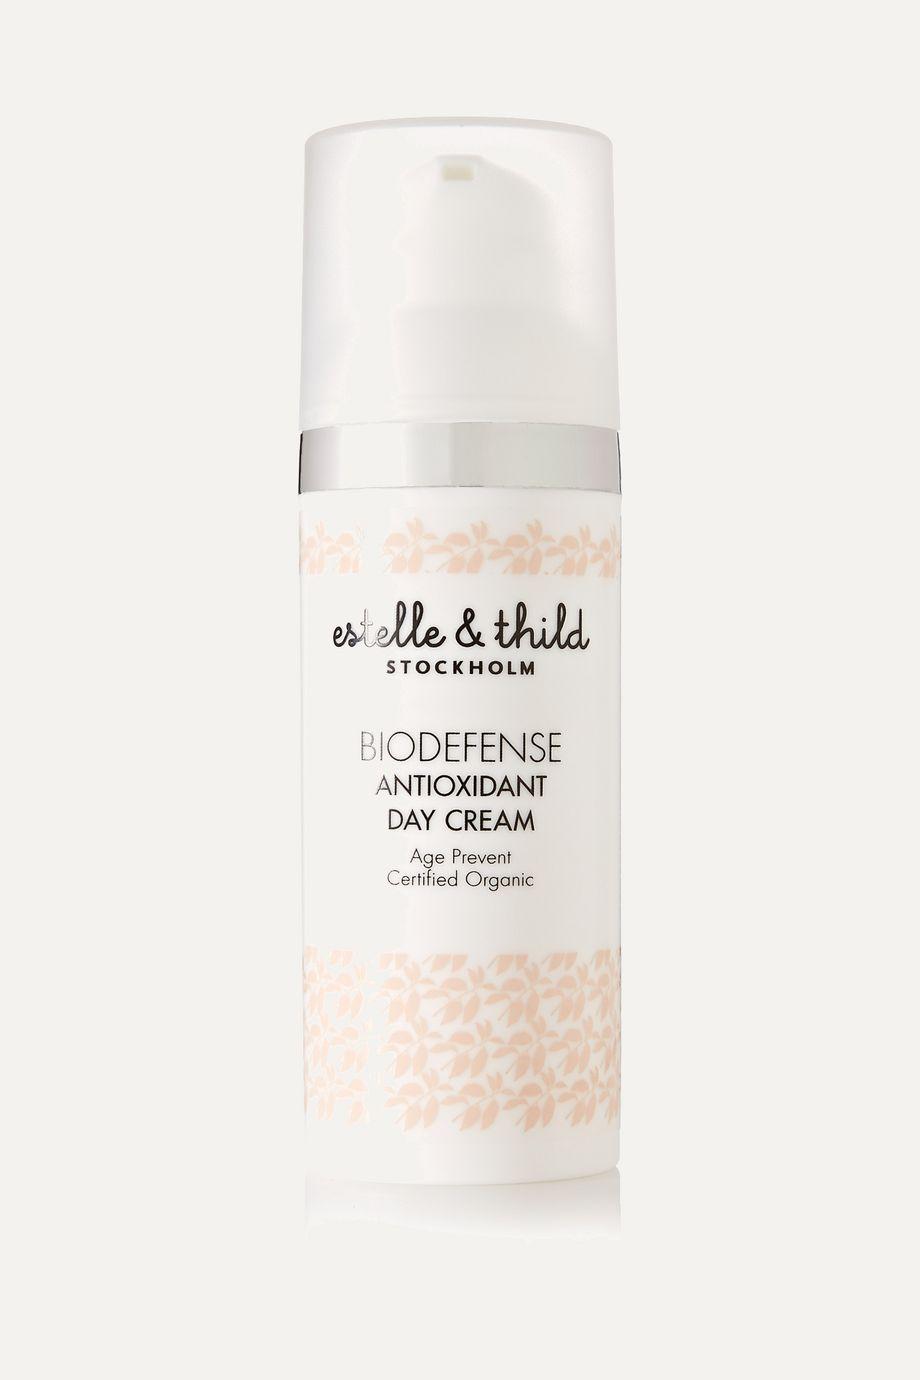 Estelle & Thild BioDefense Antioxidant Day Cream, 50ml